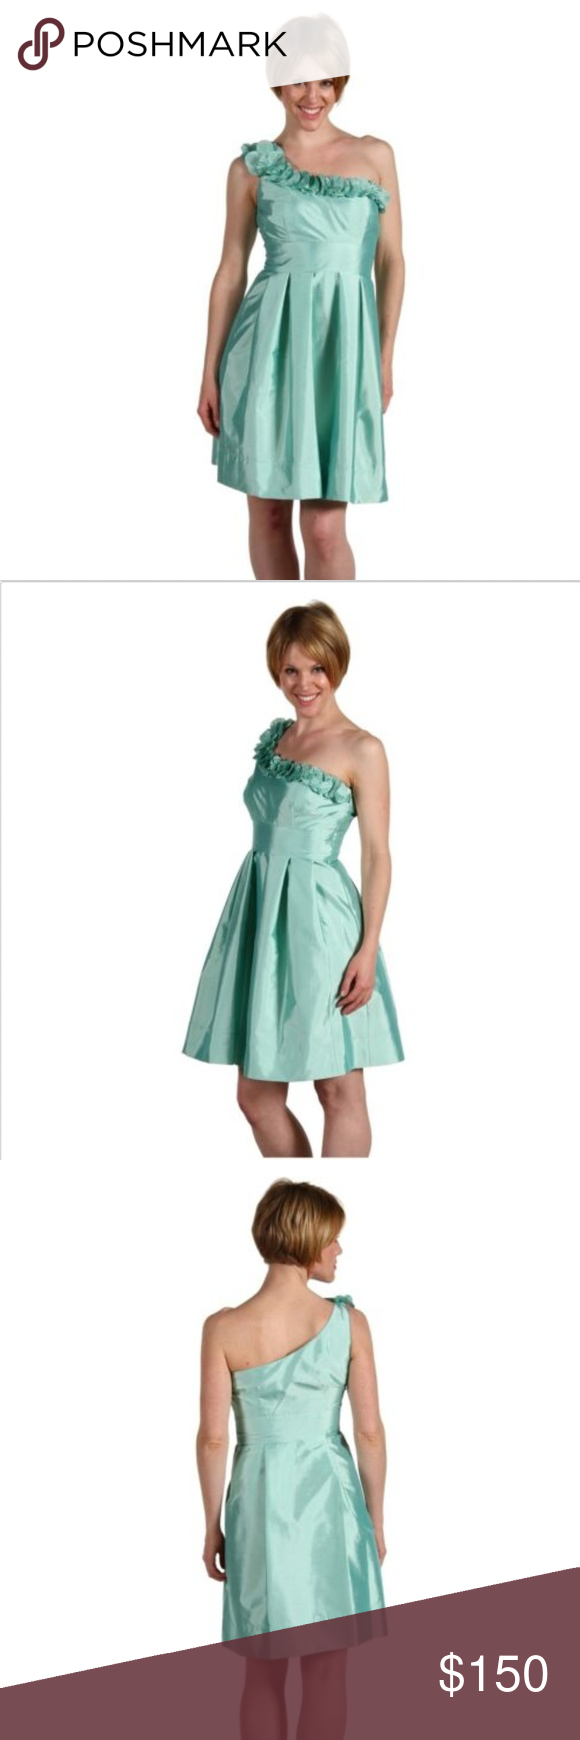 fb25b9f950 Eliza J One Shoulder Cocktail Knee Length Dress 6 Eliza J New York One  Shoulder Shantung Pleated Full Skirt Dress Color  Bay (Sea Foam Green  Color) One ...